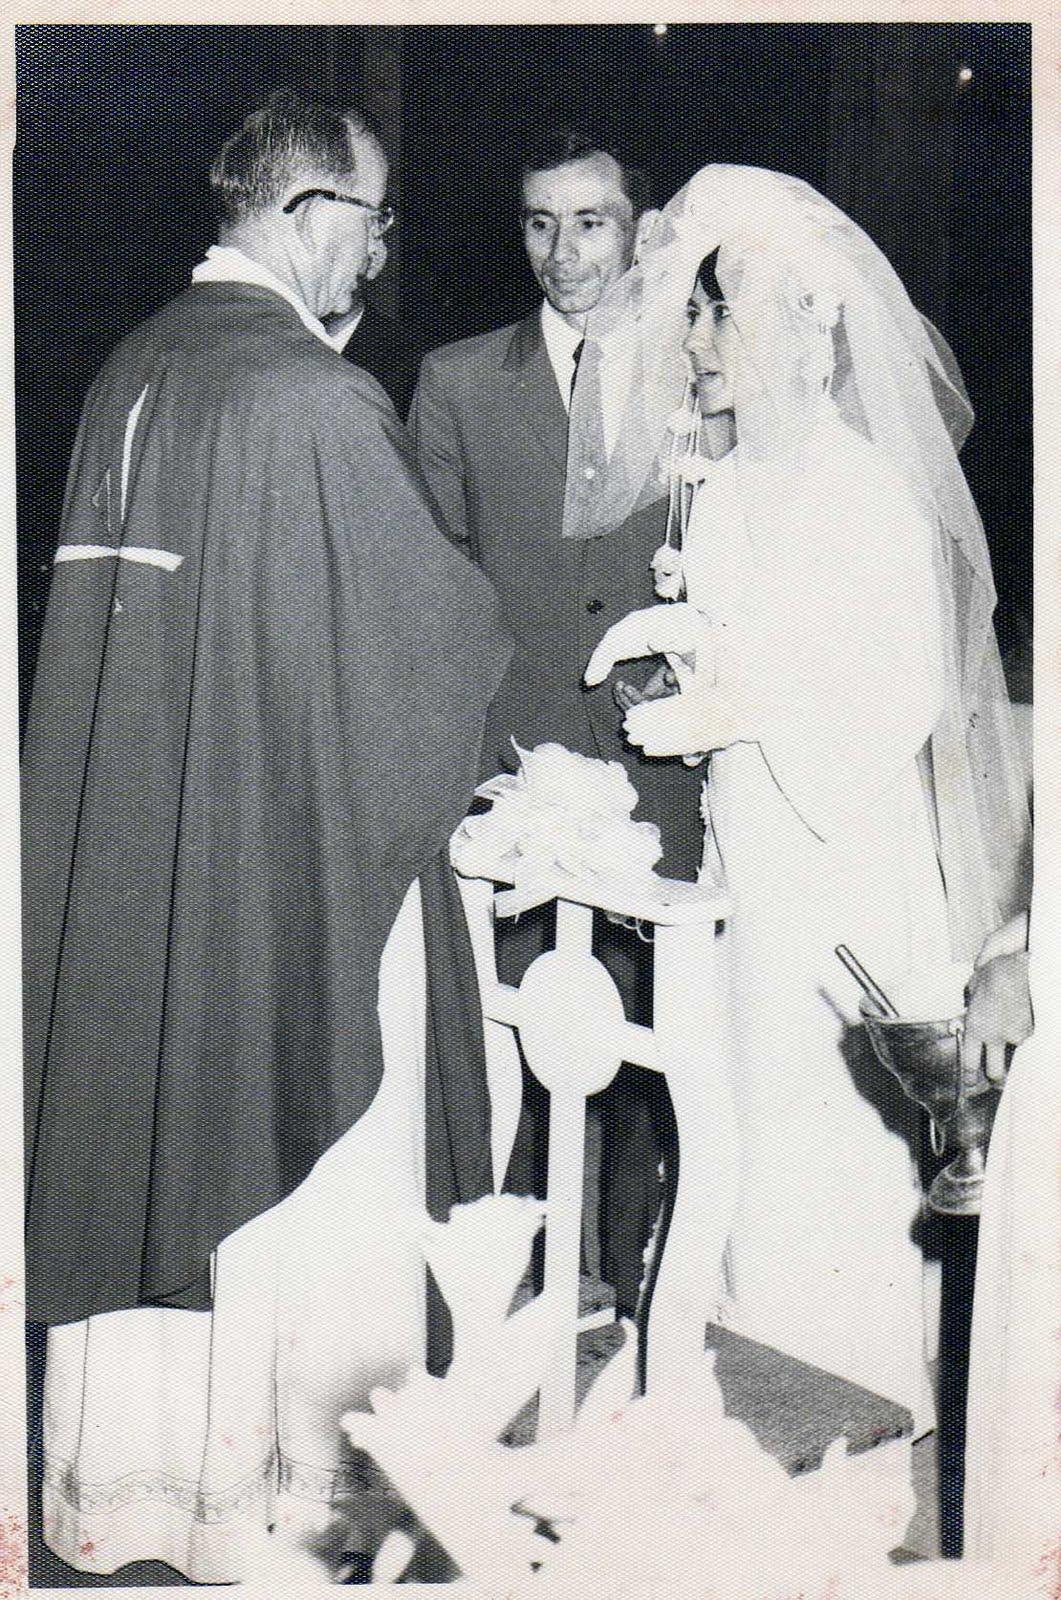 Union Matrimonio Catolico : Investigaciones jaime unión angélica matrimonio